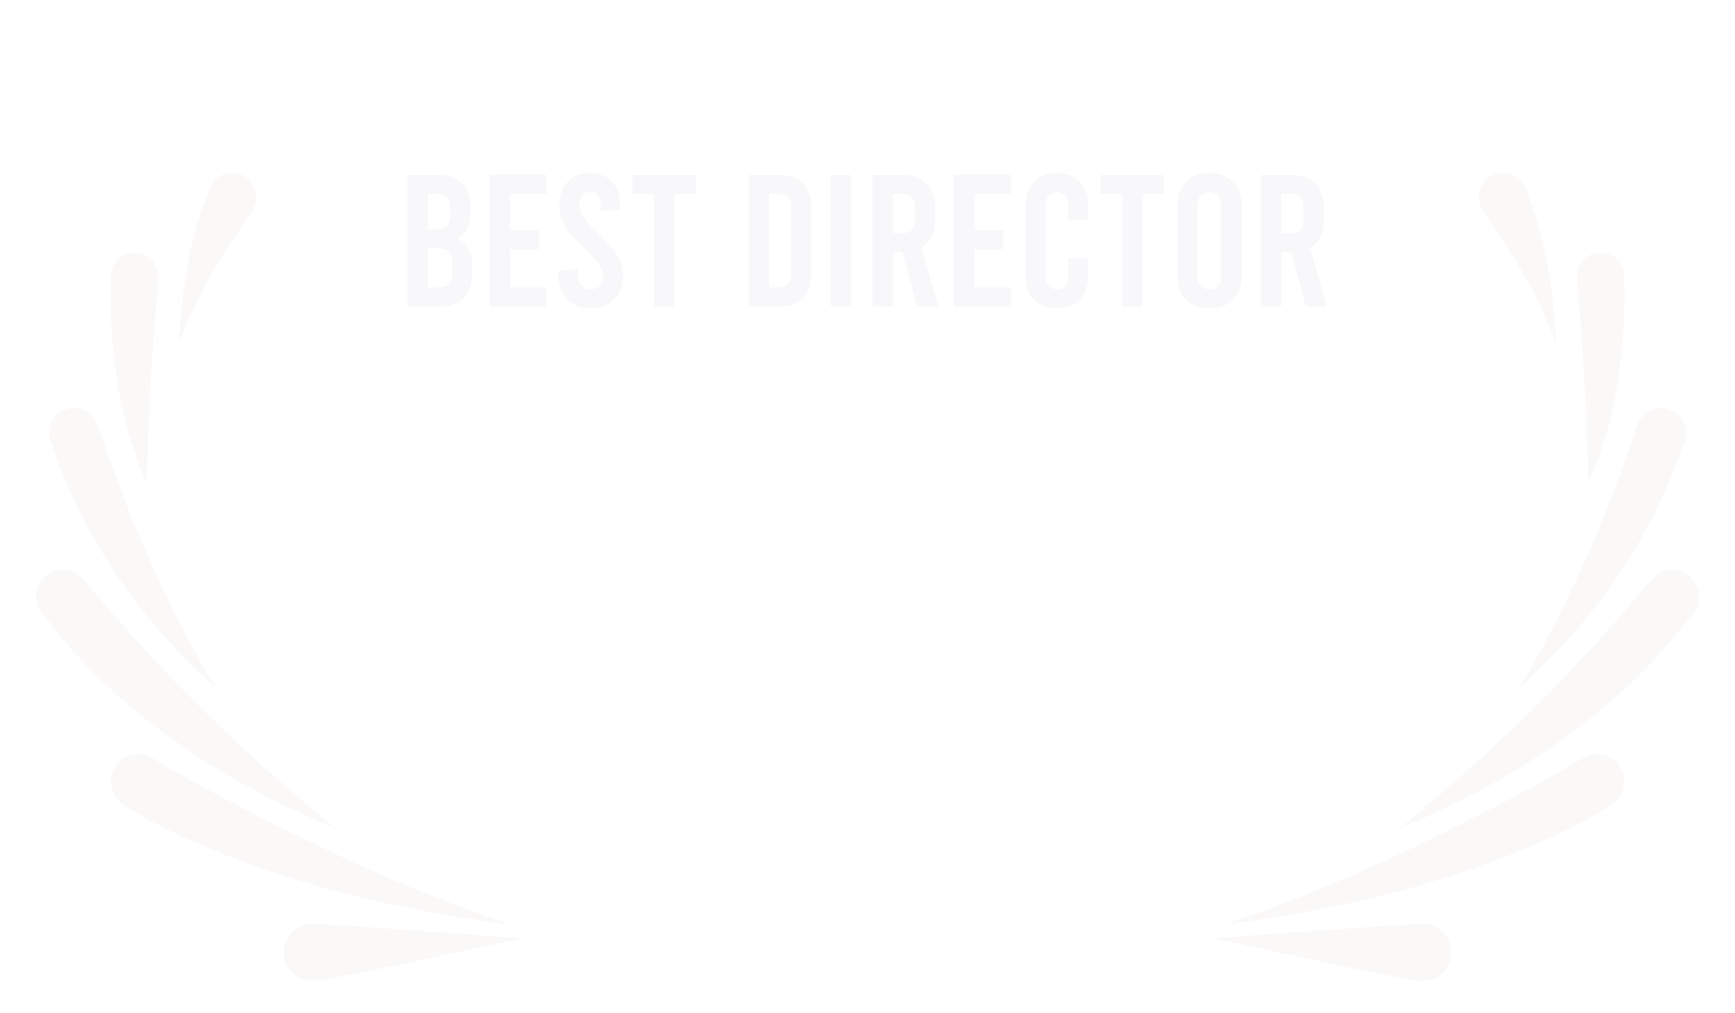 wh BEST DIRECTOR - PHILADELPHIA INDEPEND